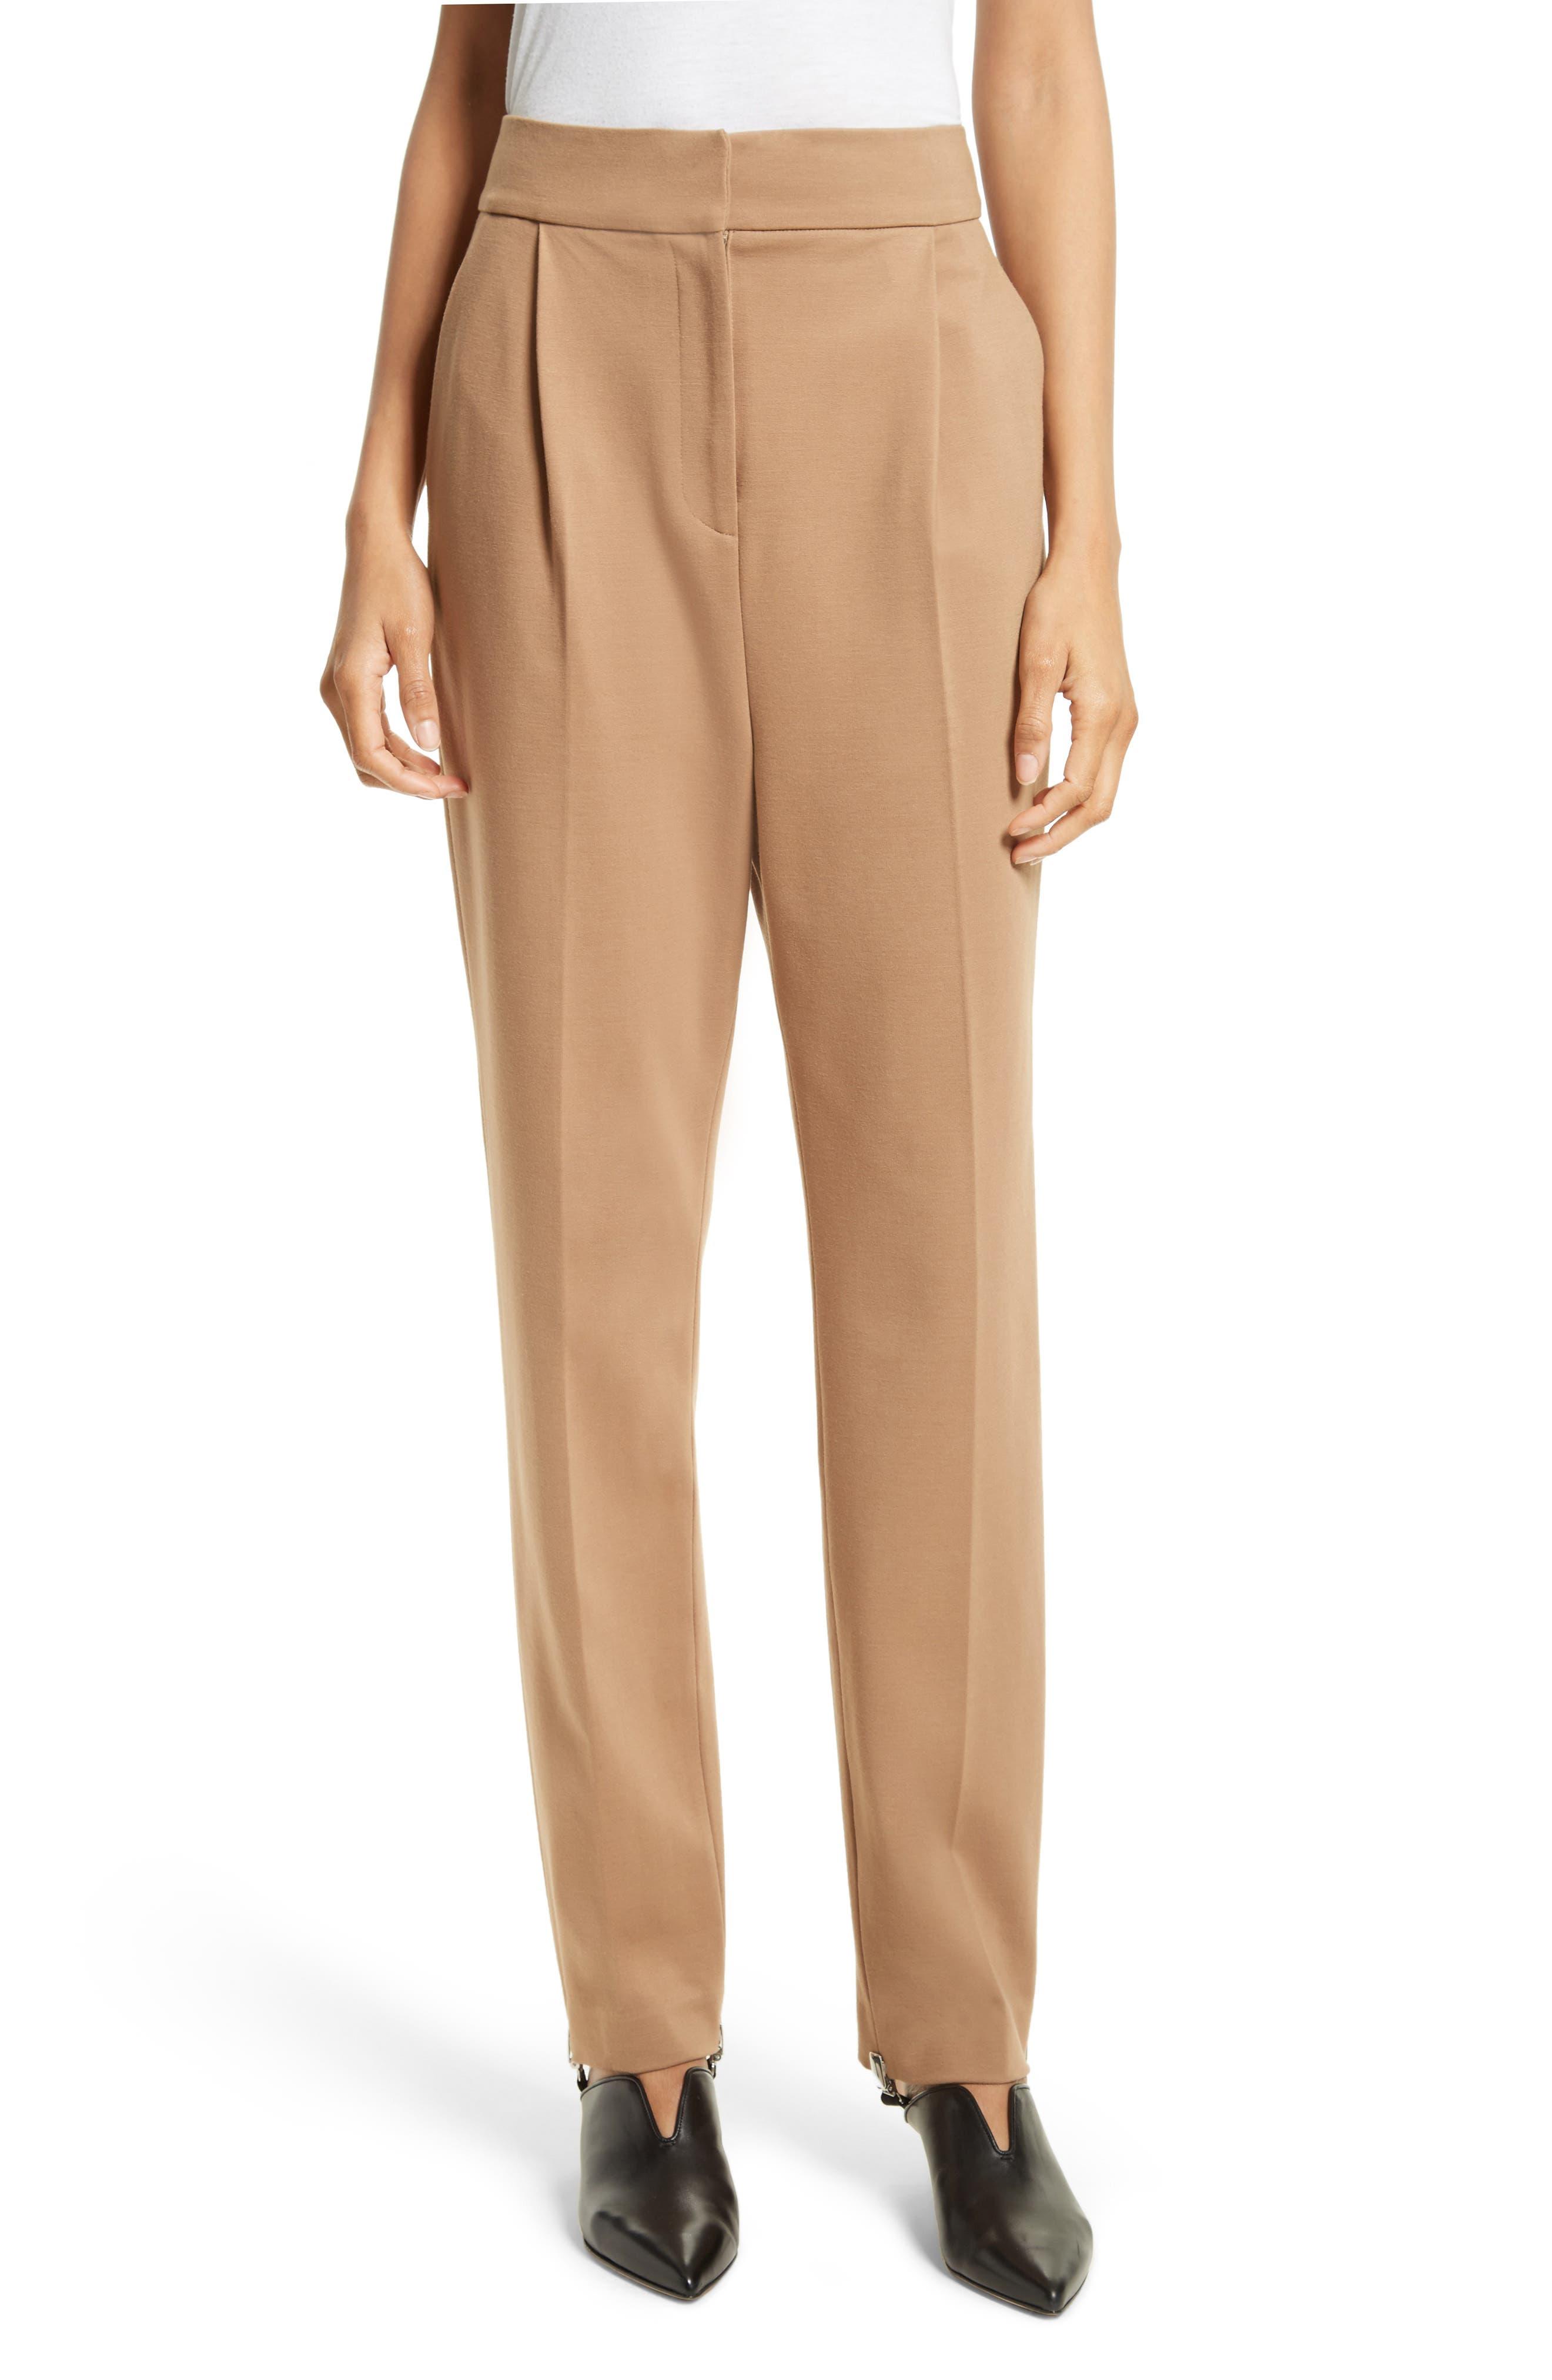 Bond Stretch Stirrup Pants,                         Main,                         color, 250